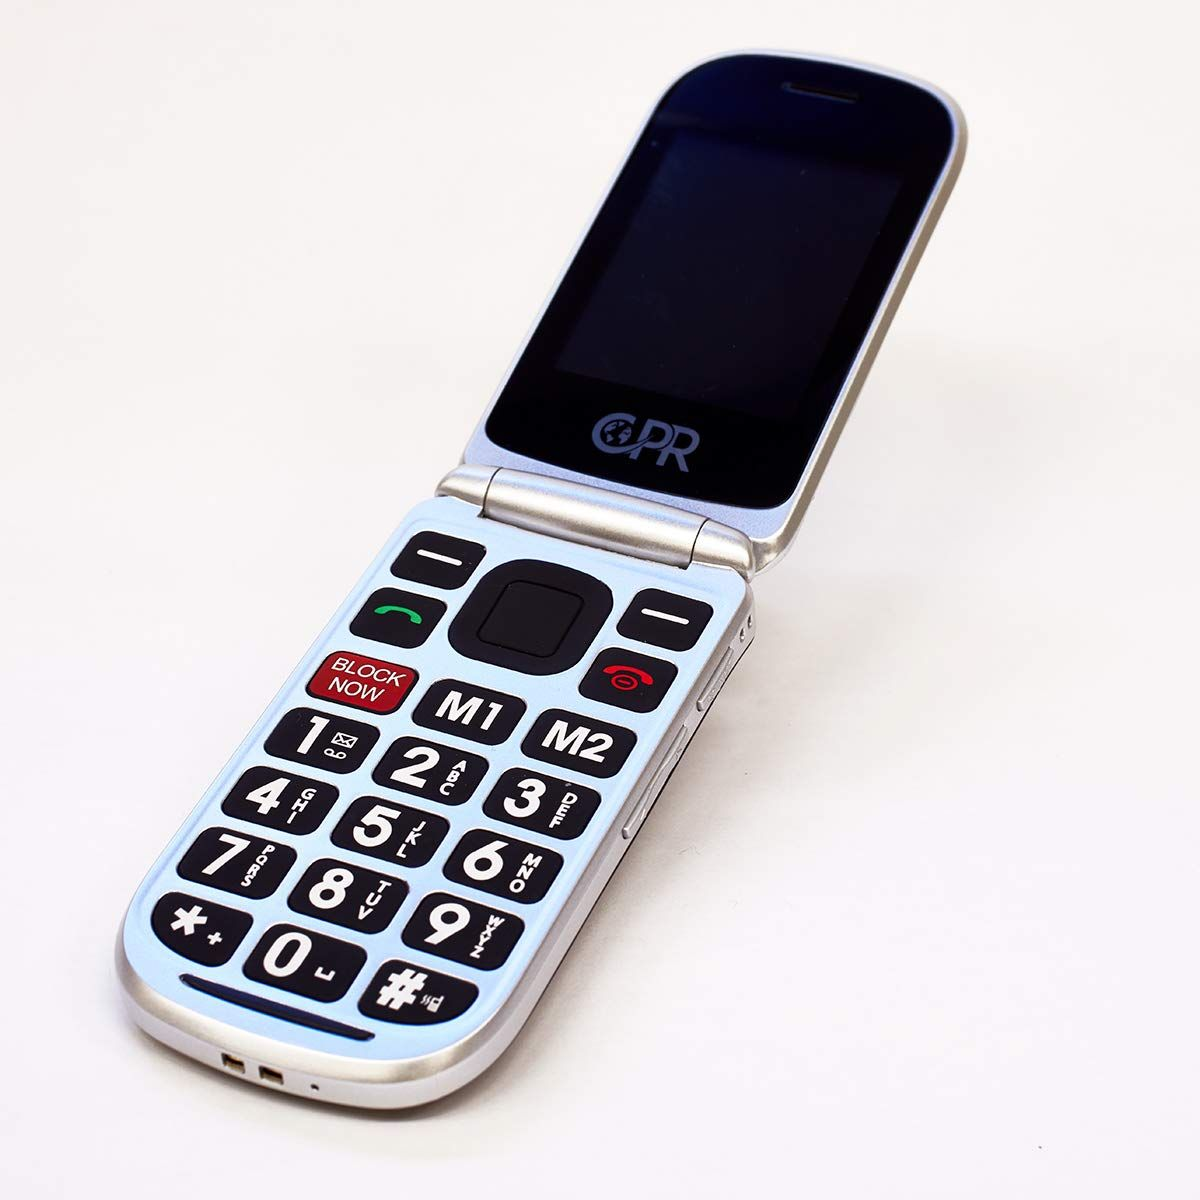 Cpr Cs900 Flip Cell Phone For Seniors Petagadget In 2020 Cell